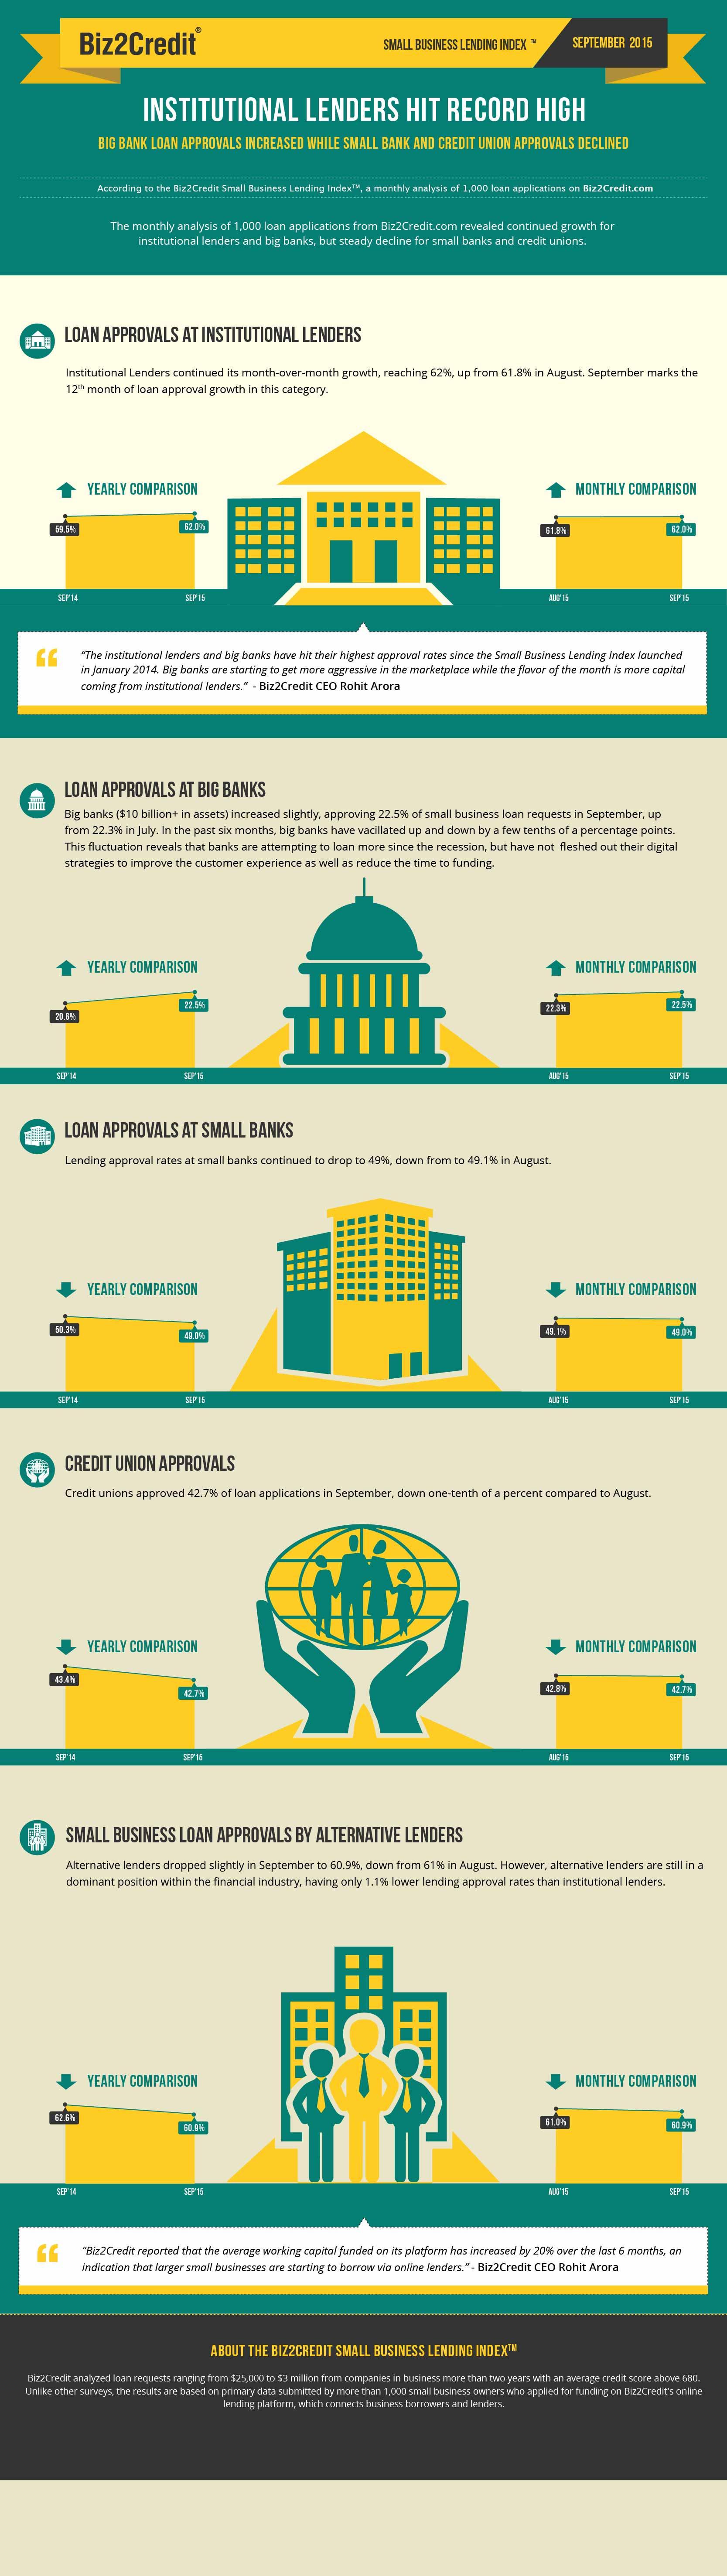 Sept 15 Lending Index Infographic